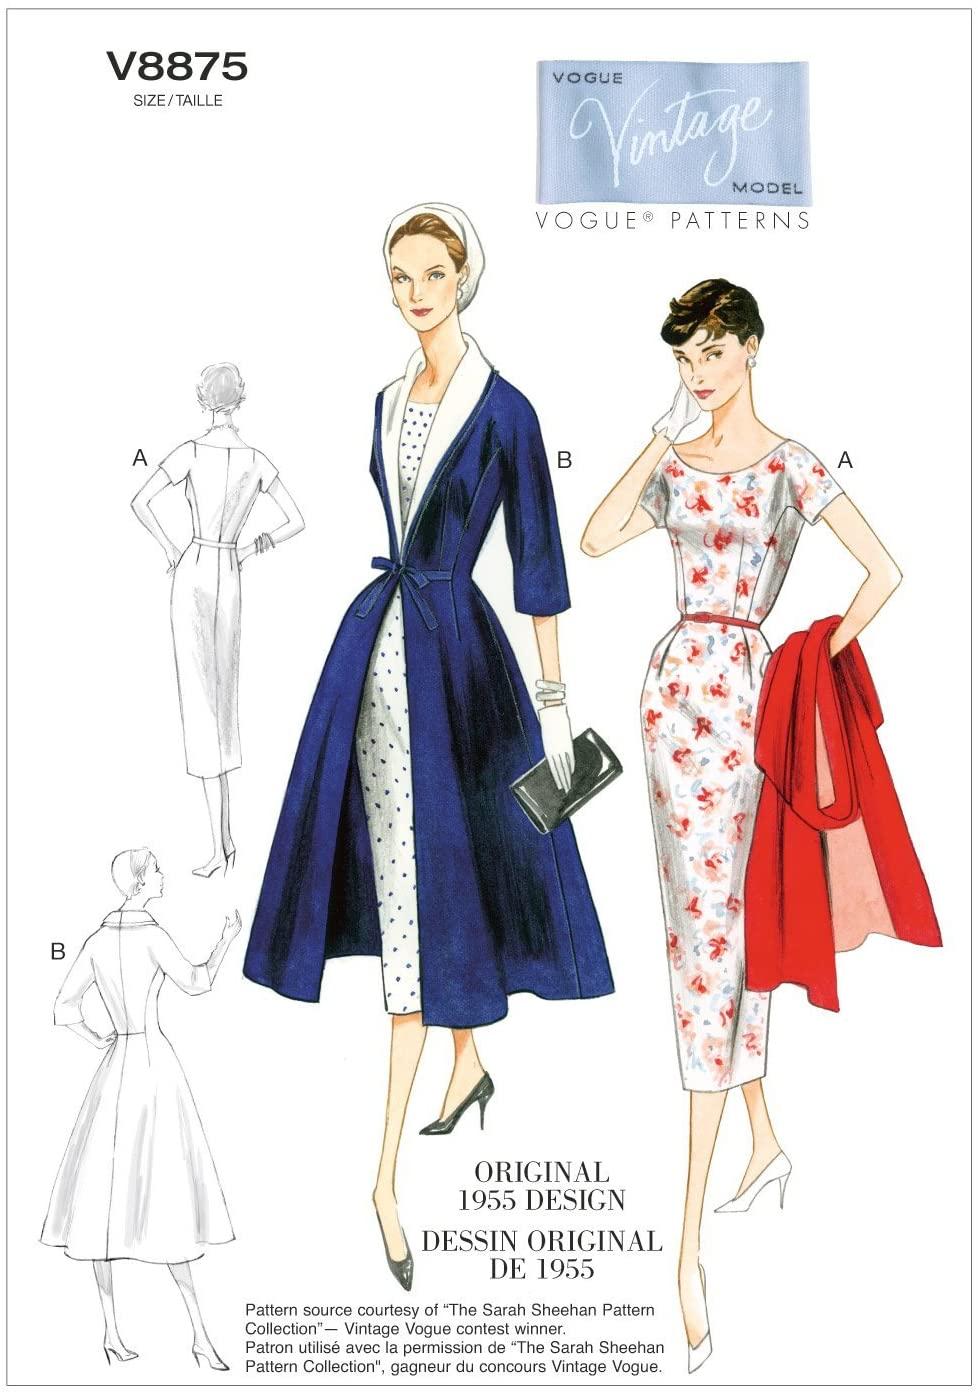 VOGUE PATTERNS V8875 Misses' Dress/Belt/Coat and Detachable Collar Sewing Template, Size B5 (8-10-12-14-16)